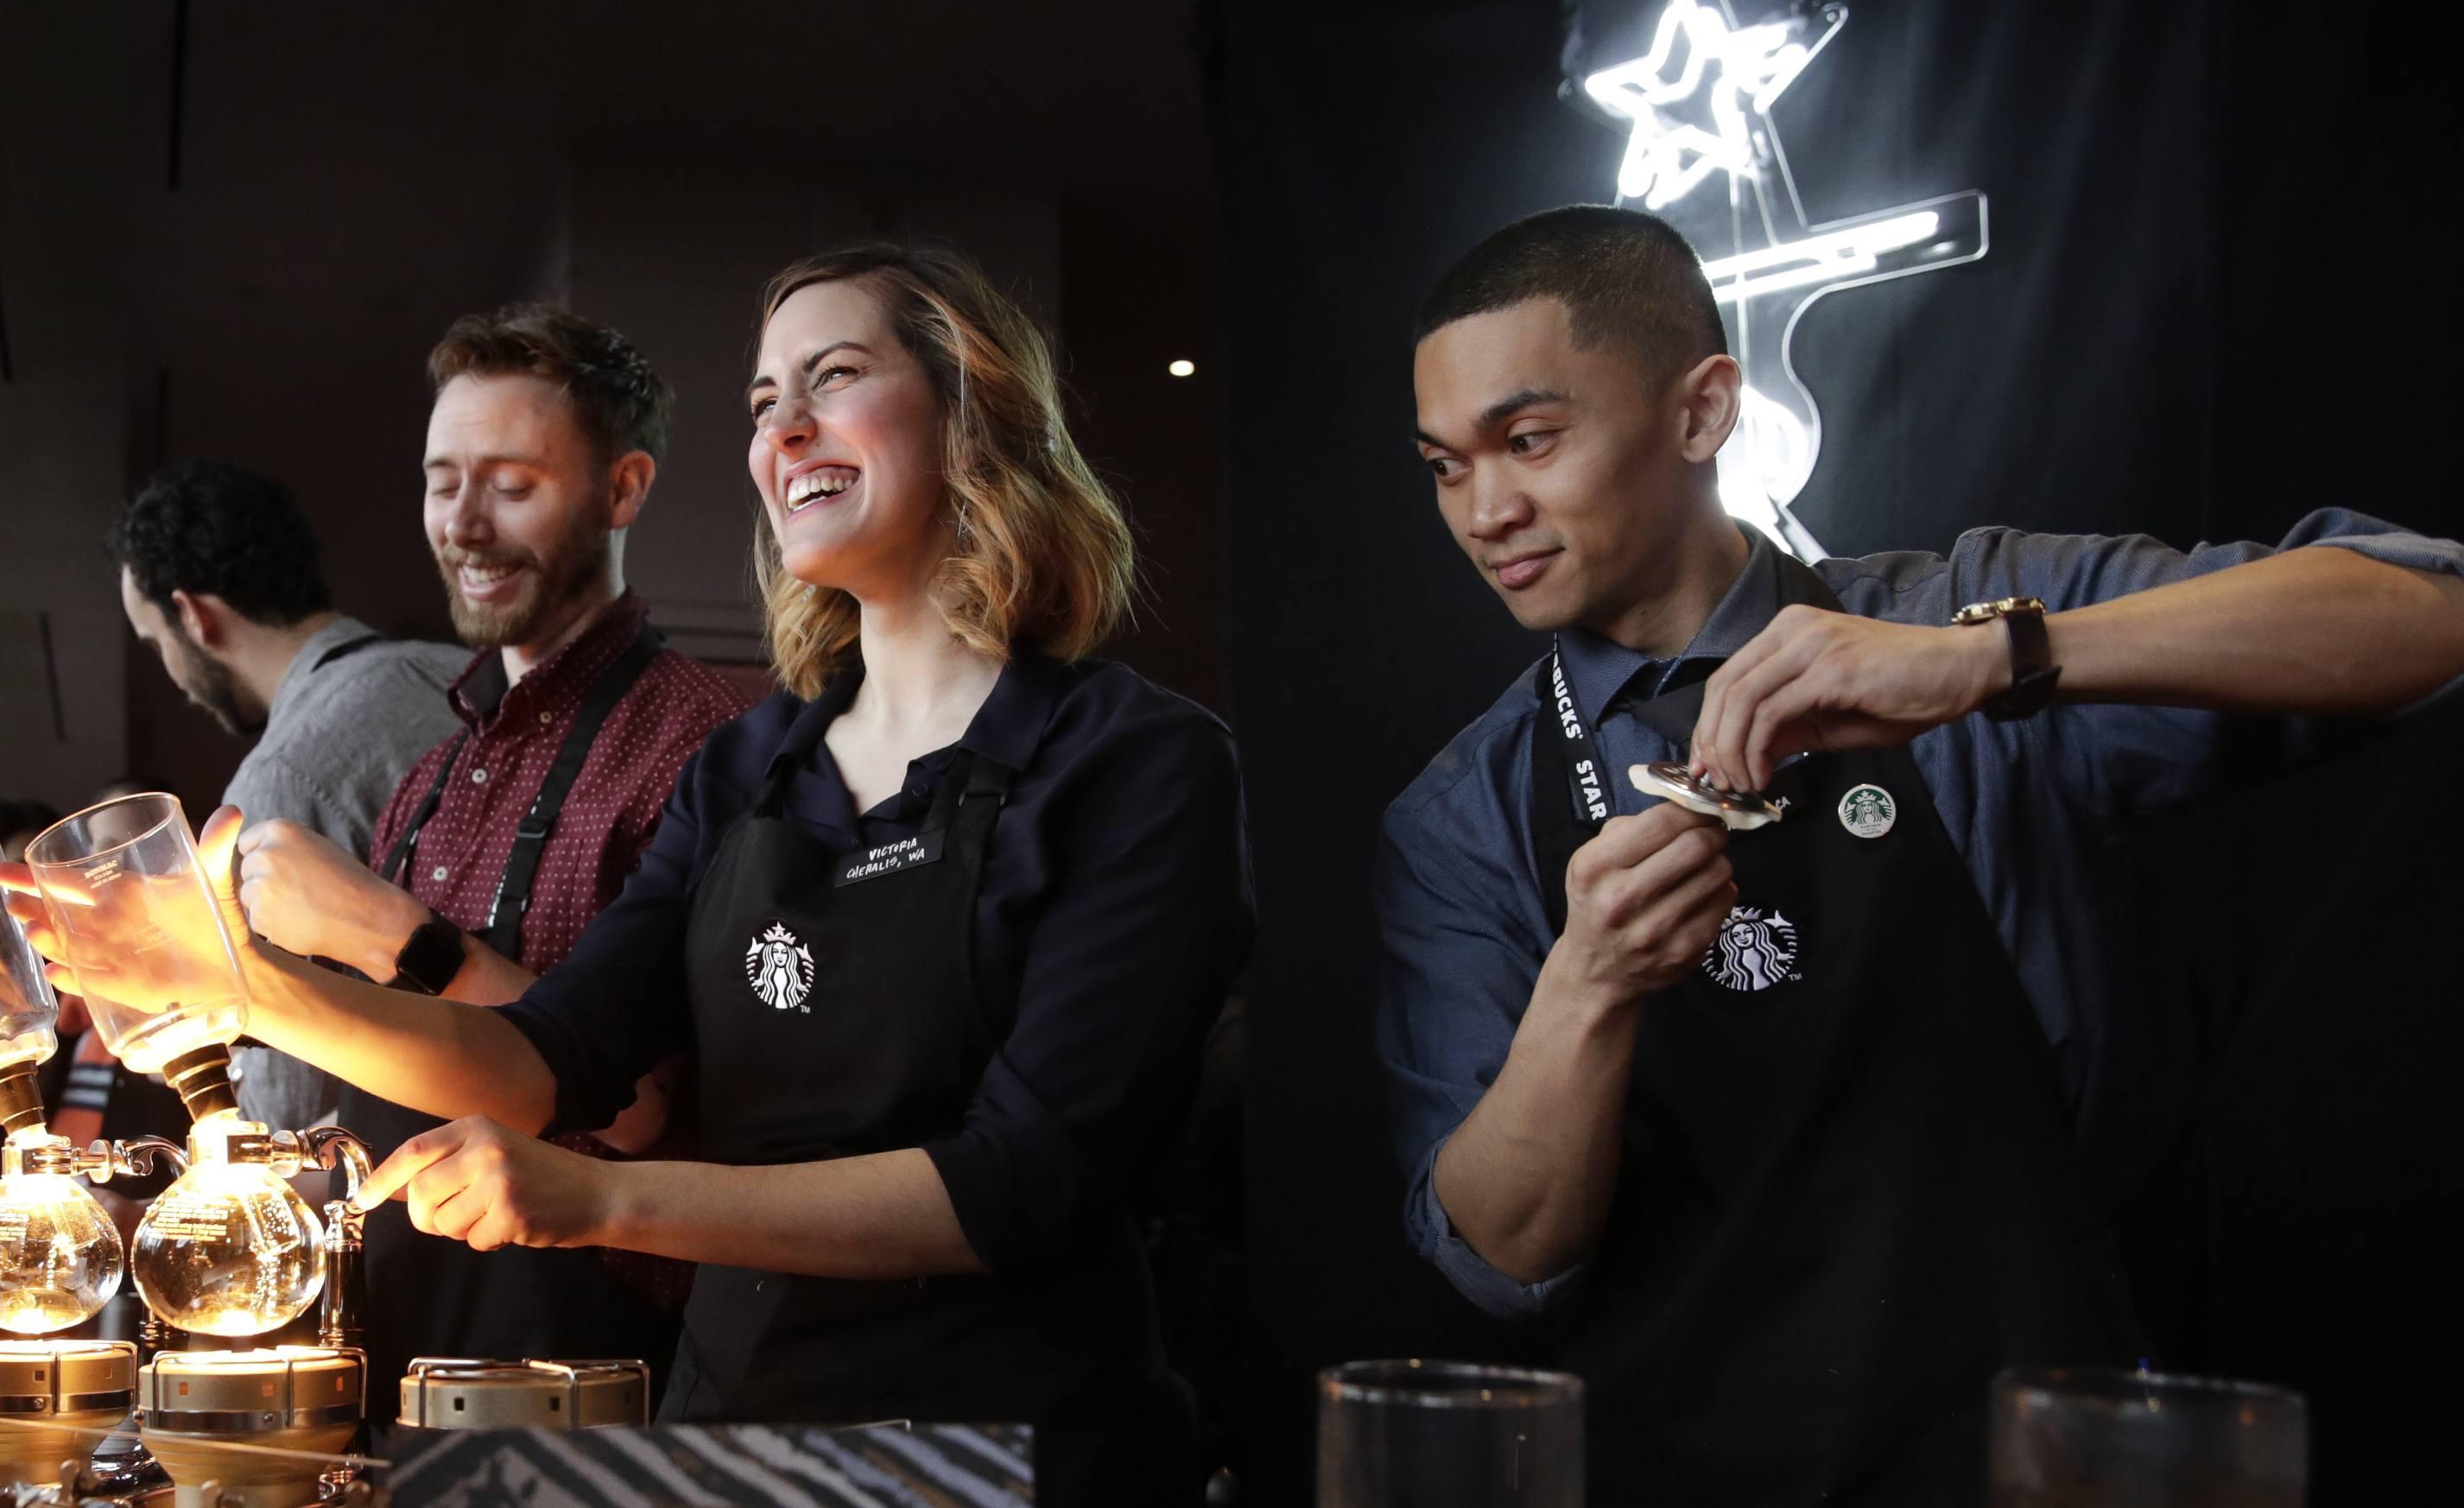 Baristas brew siphon coffee at Starbucks' Annual Meeting